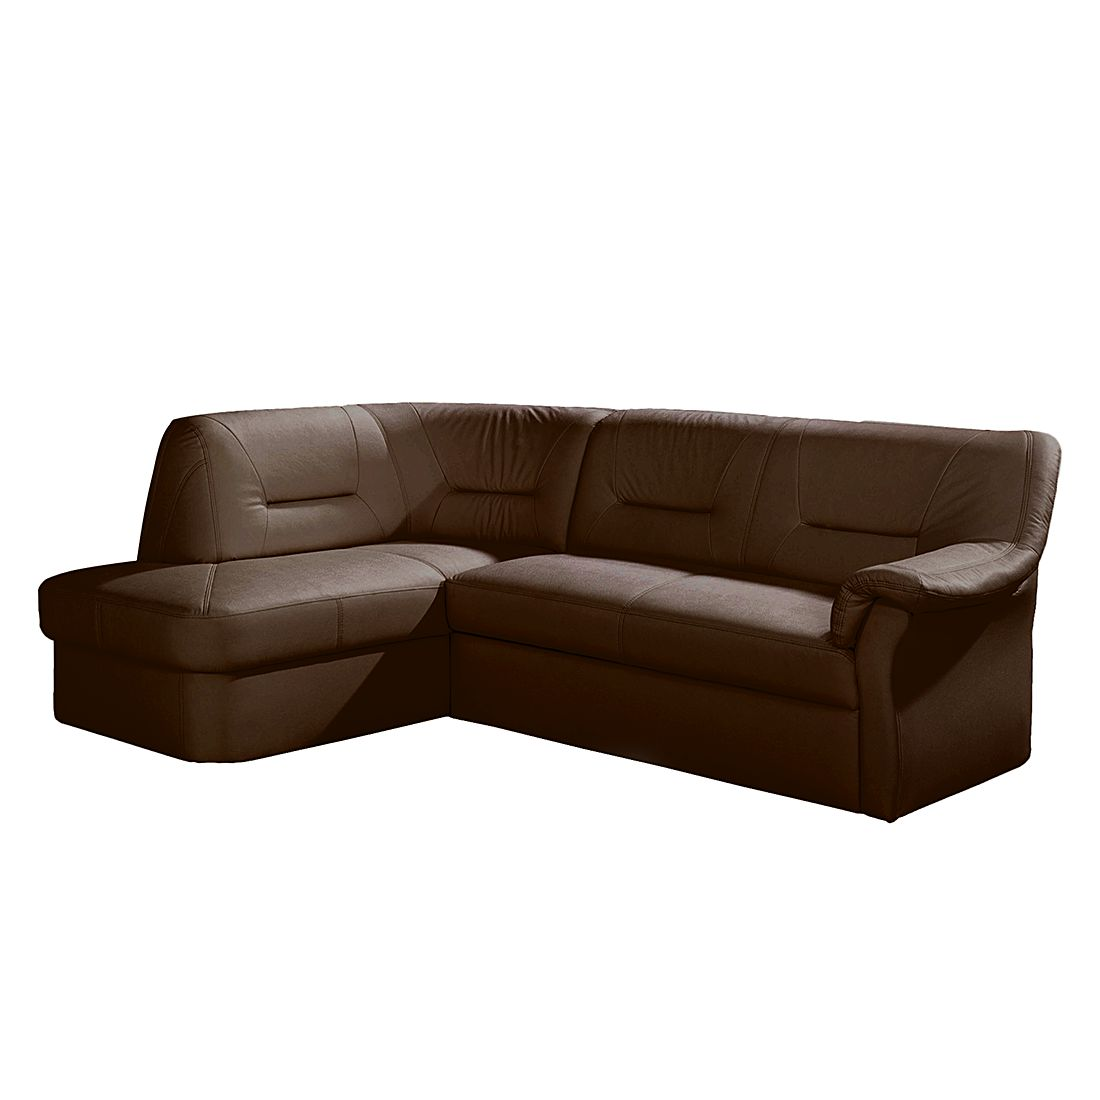 libreria divisoria ikea. Black Bedroom Furniture Sets. Home Design Ideas